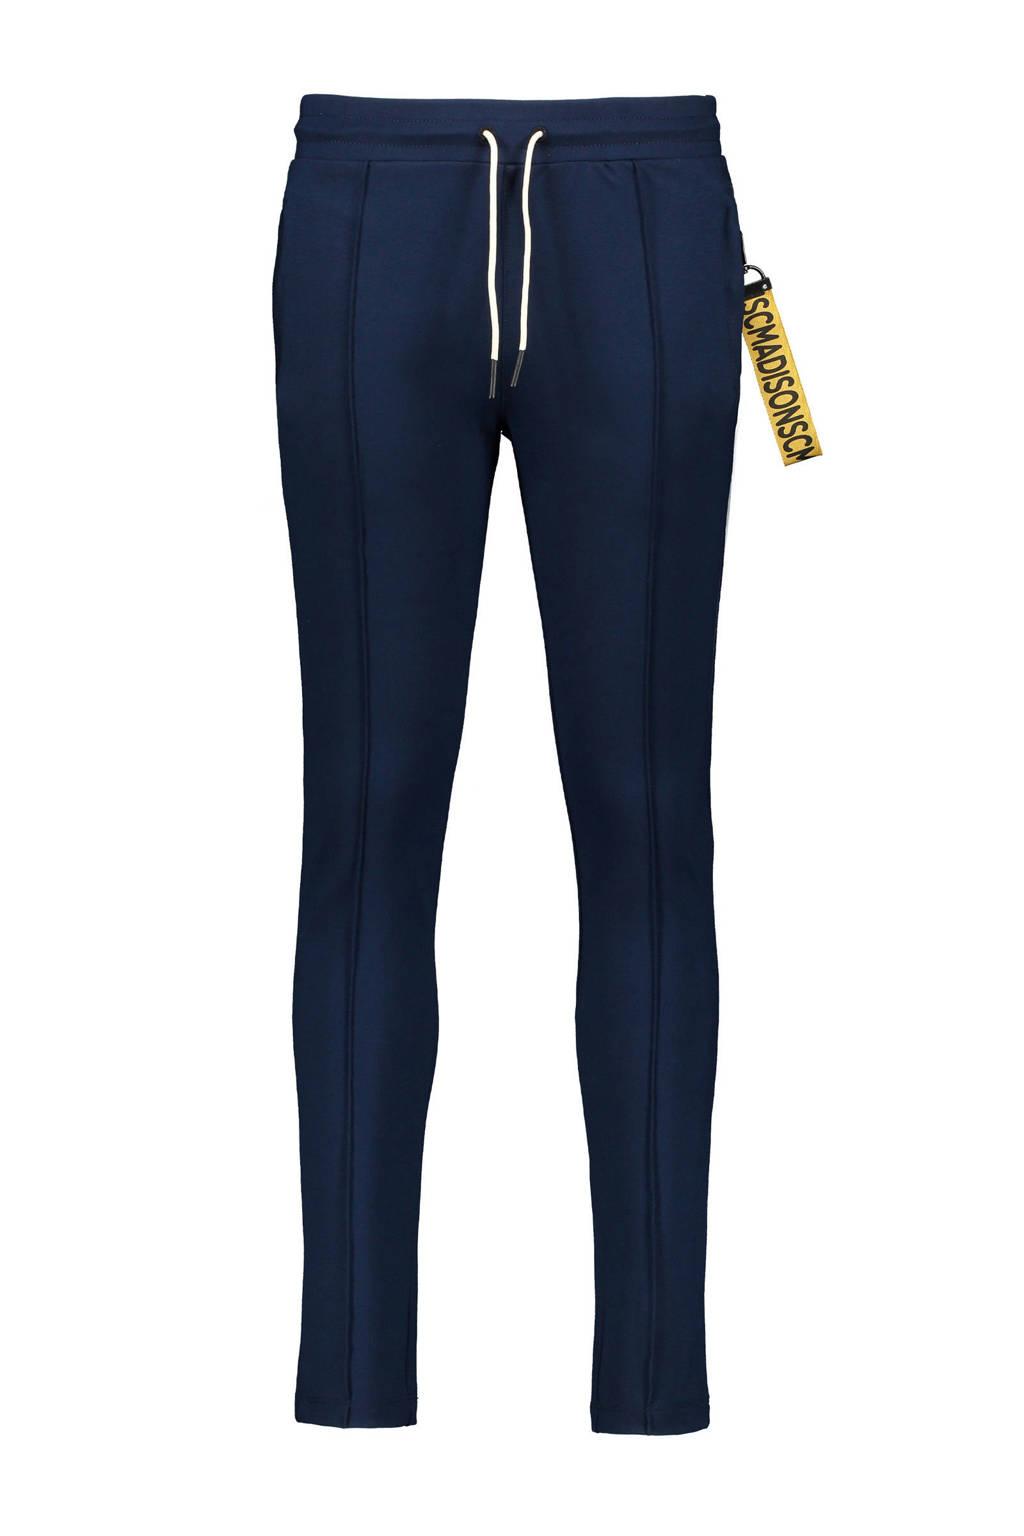 Street called Madison slim fit broek Relax donkerblauw, Donkerblauw